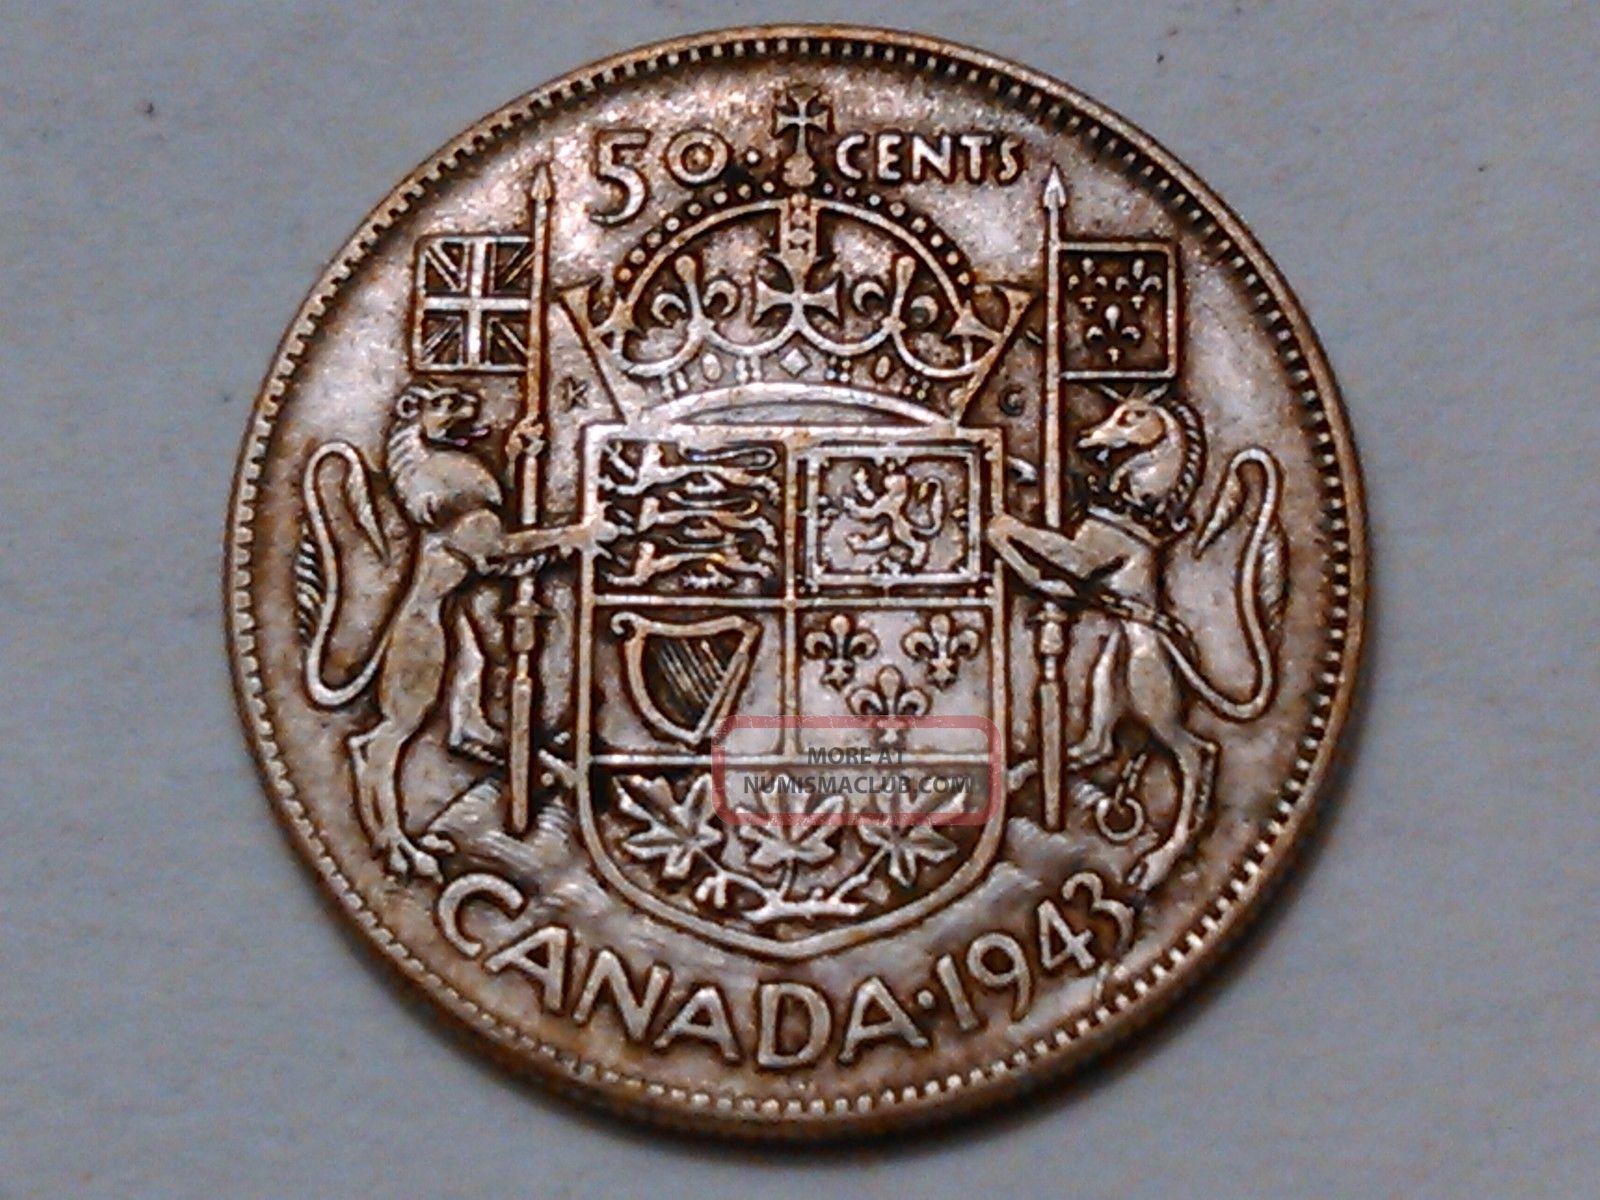 1943 Canada 50 Cents Coin 80 Silver